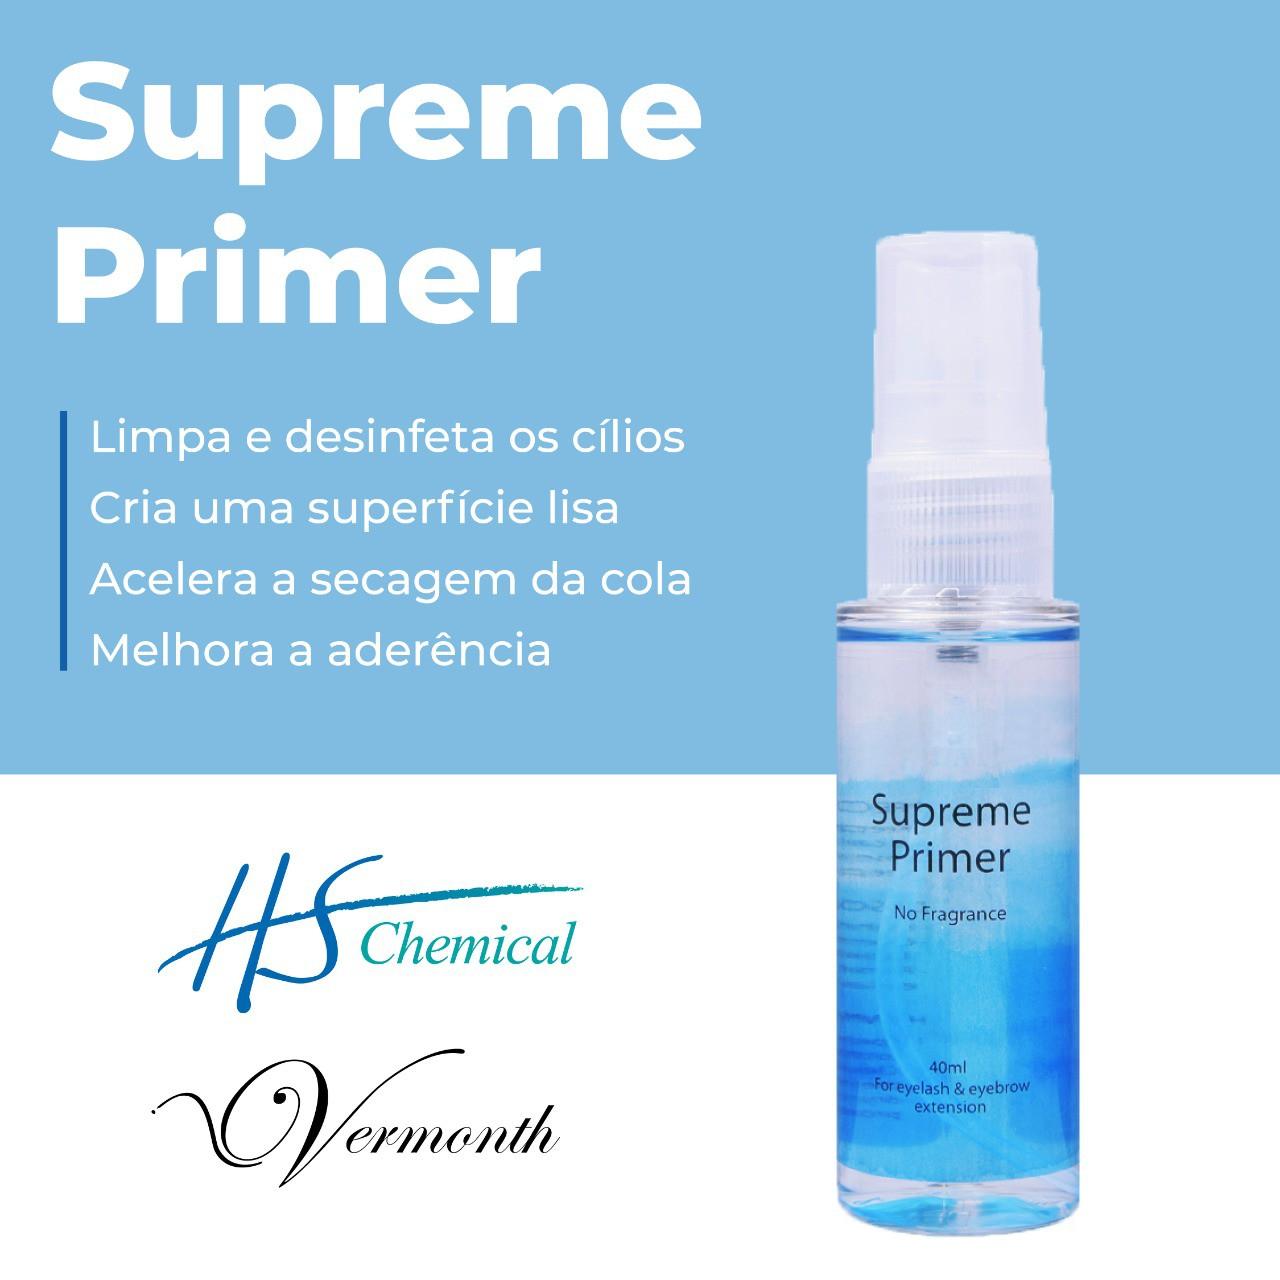 Supreme Primer Pré Extensão/Alongamento De Cílios